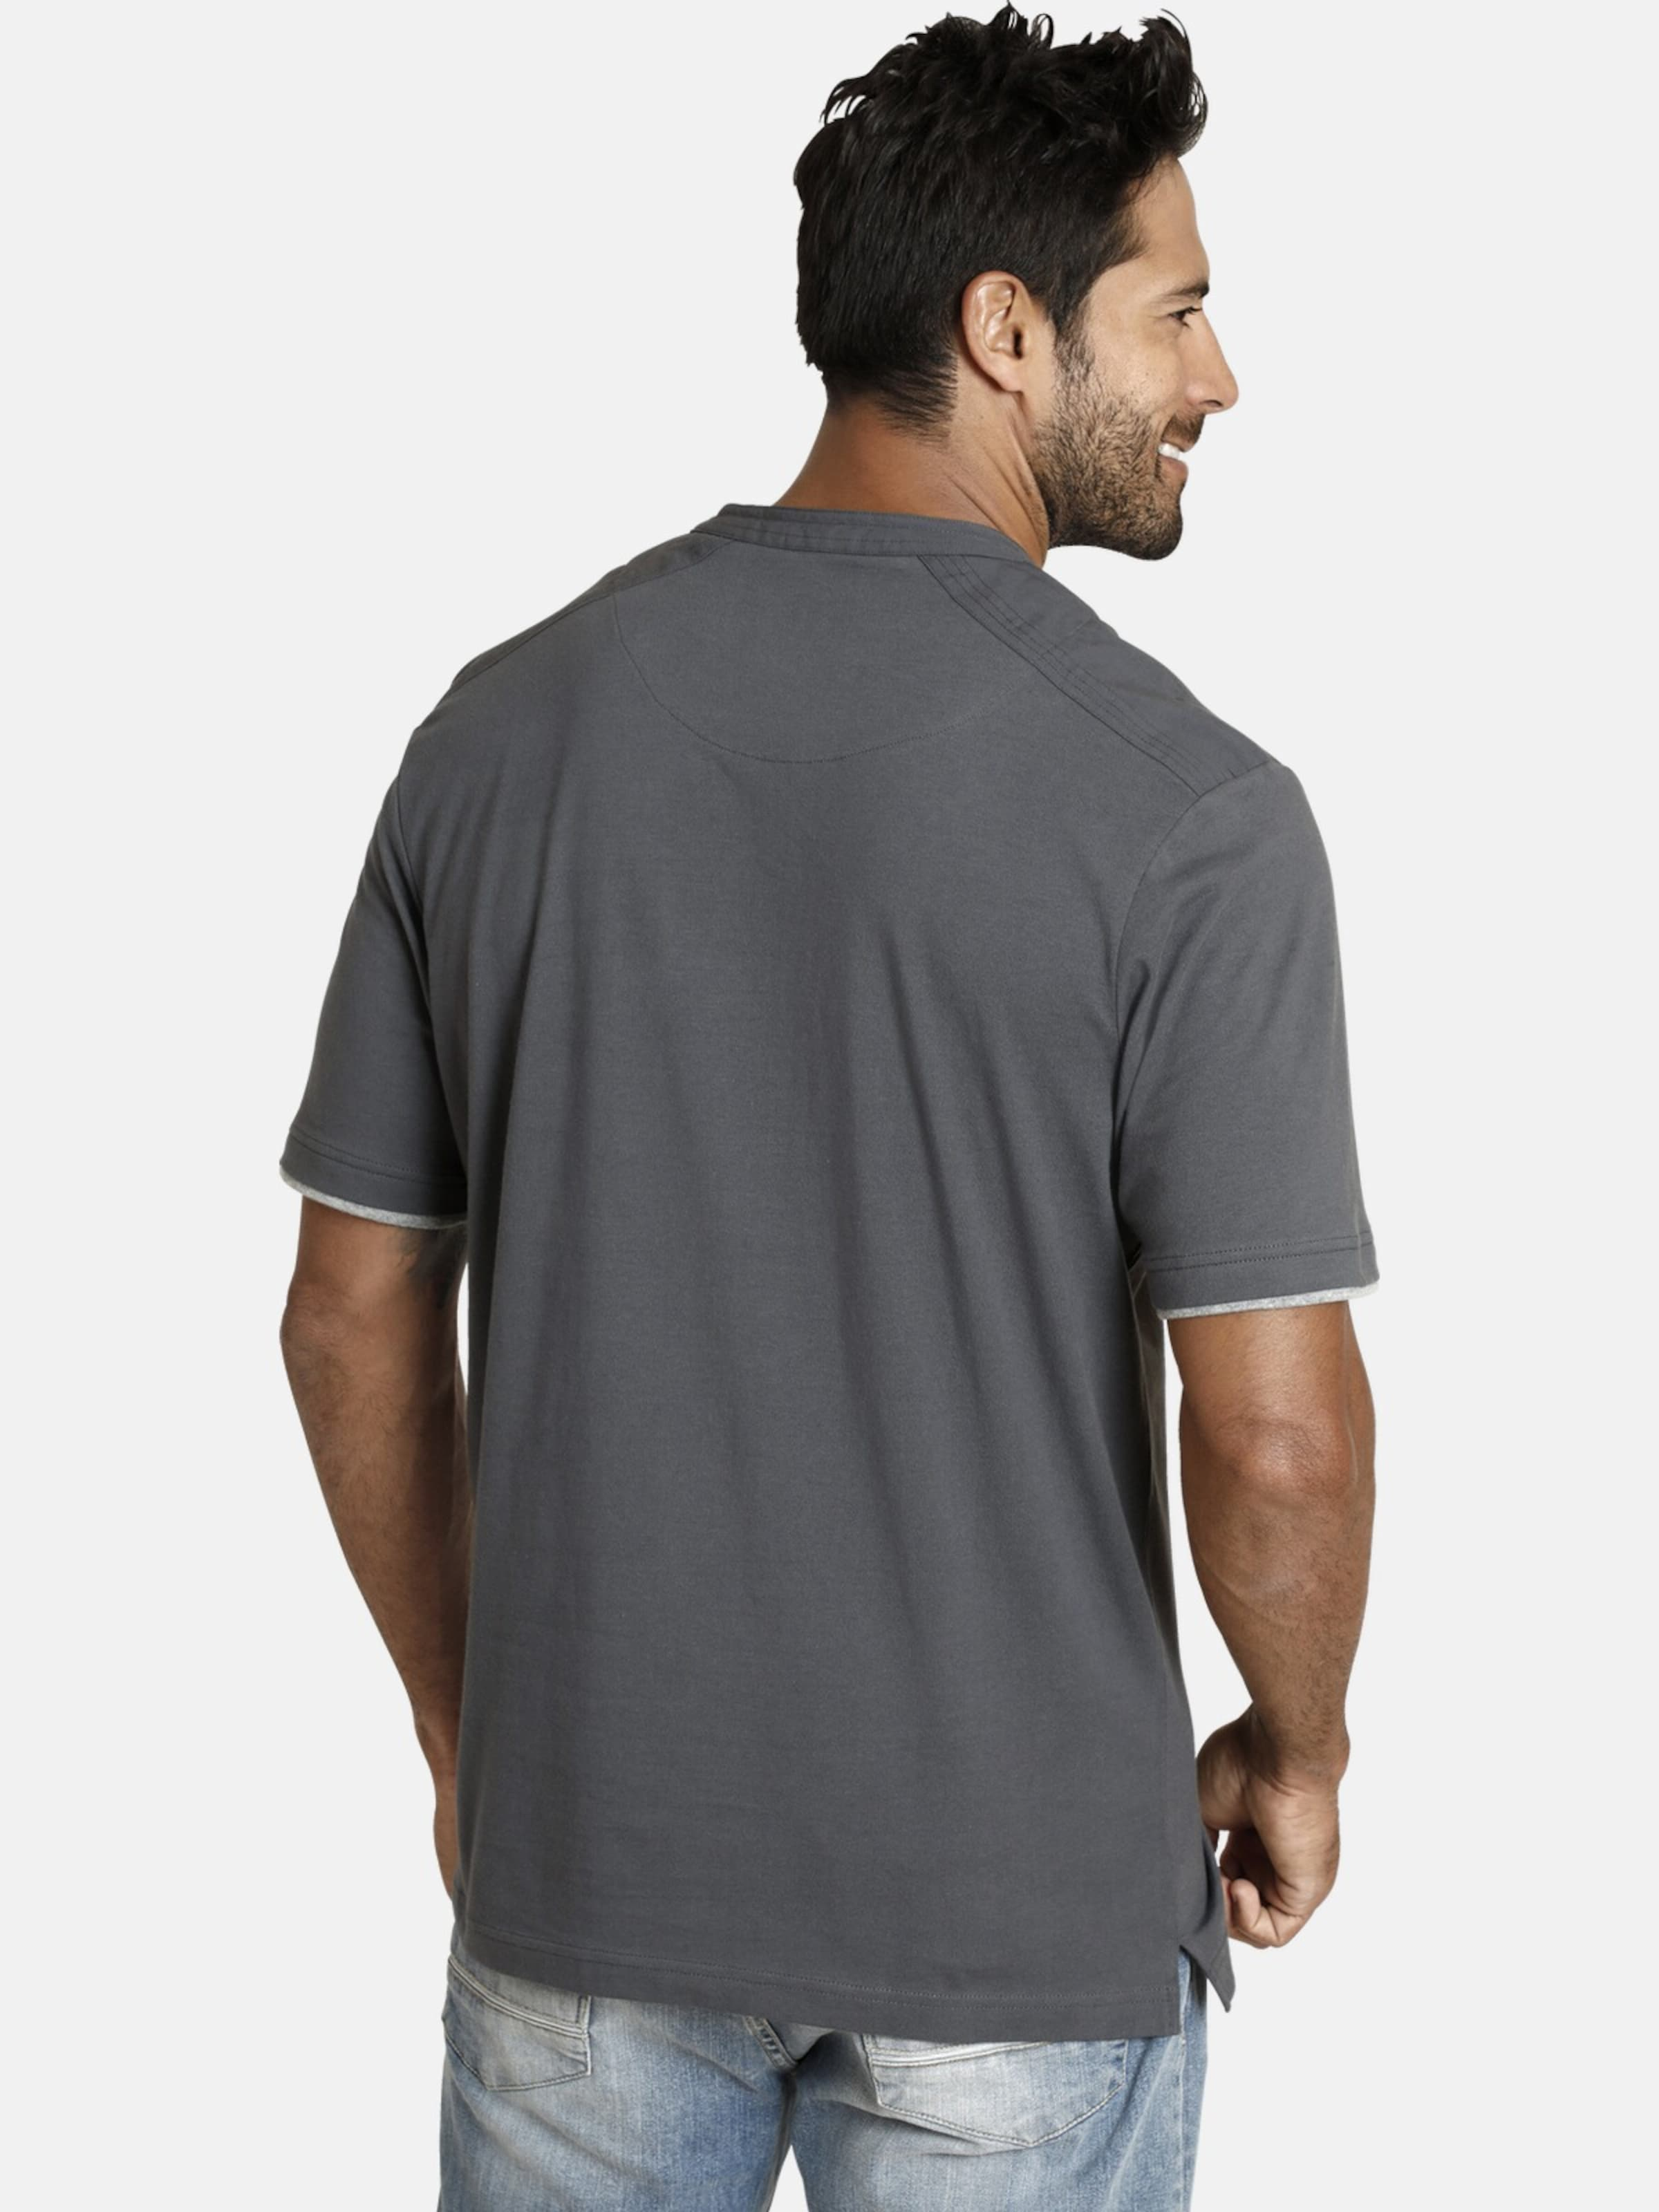 Jan In shirt Vanderstorm 'nante' T Dunkelgrau srxBQCtohd